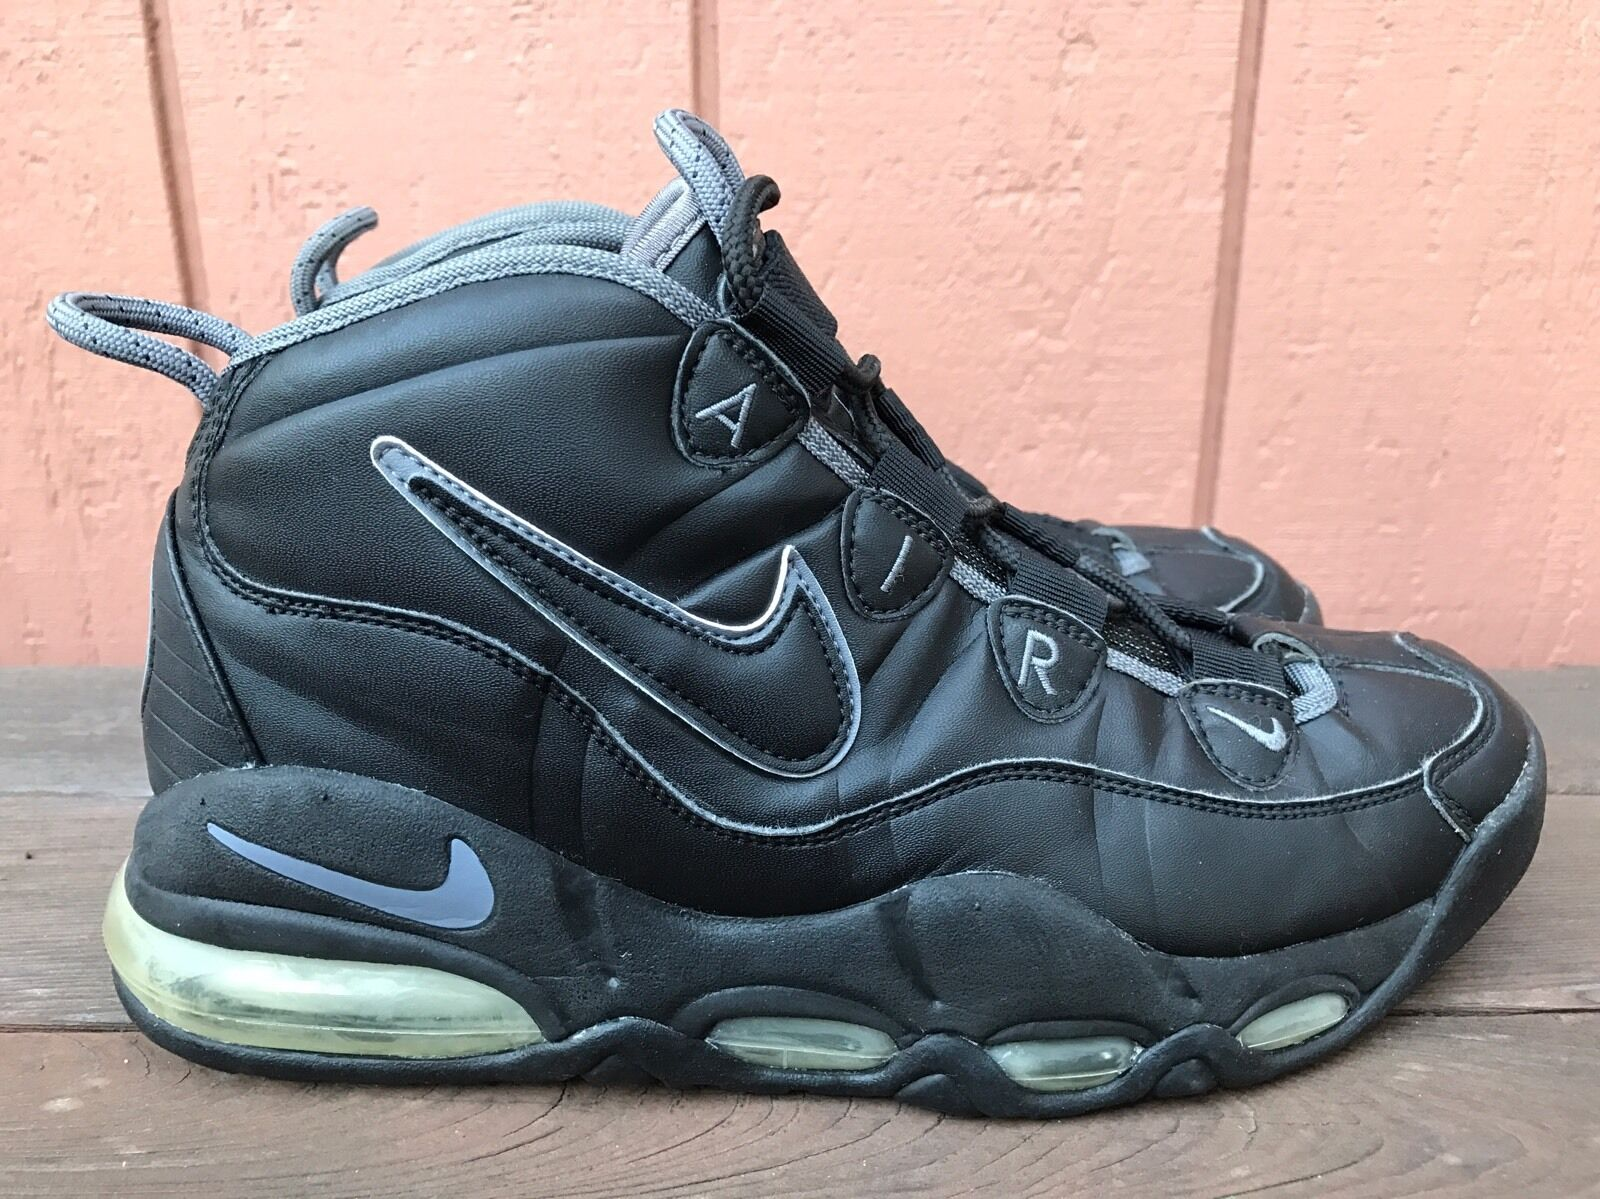 EUC RARE Nike Air Max Tempo US 8 Black Sneakers 624011 001